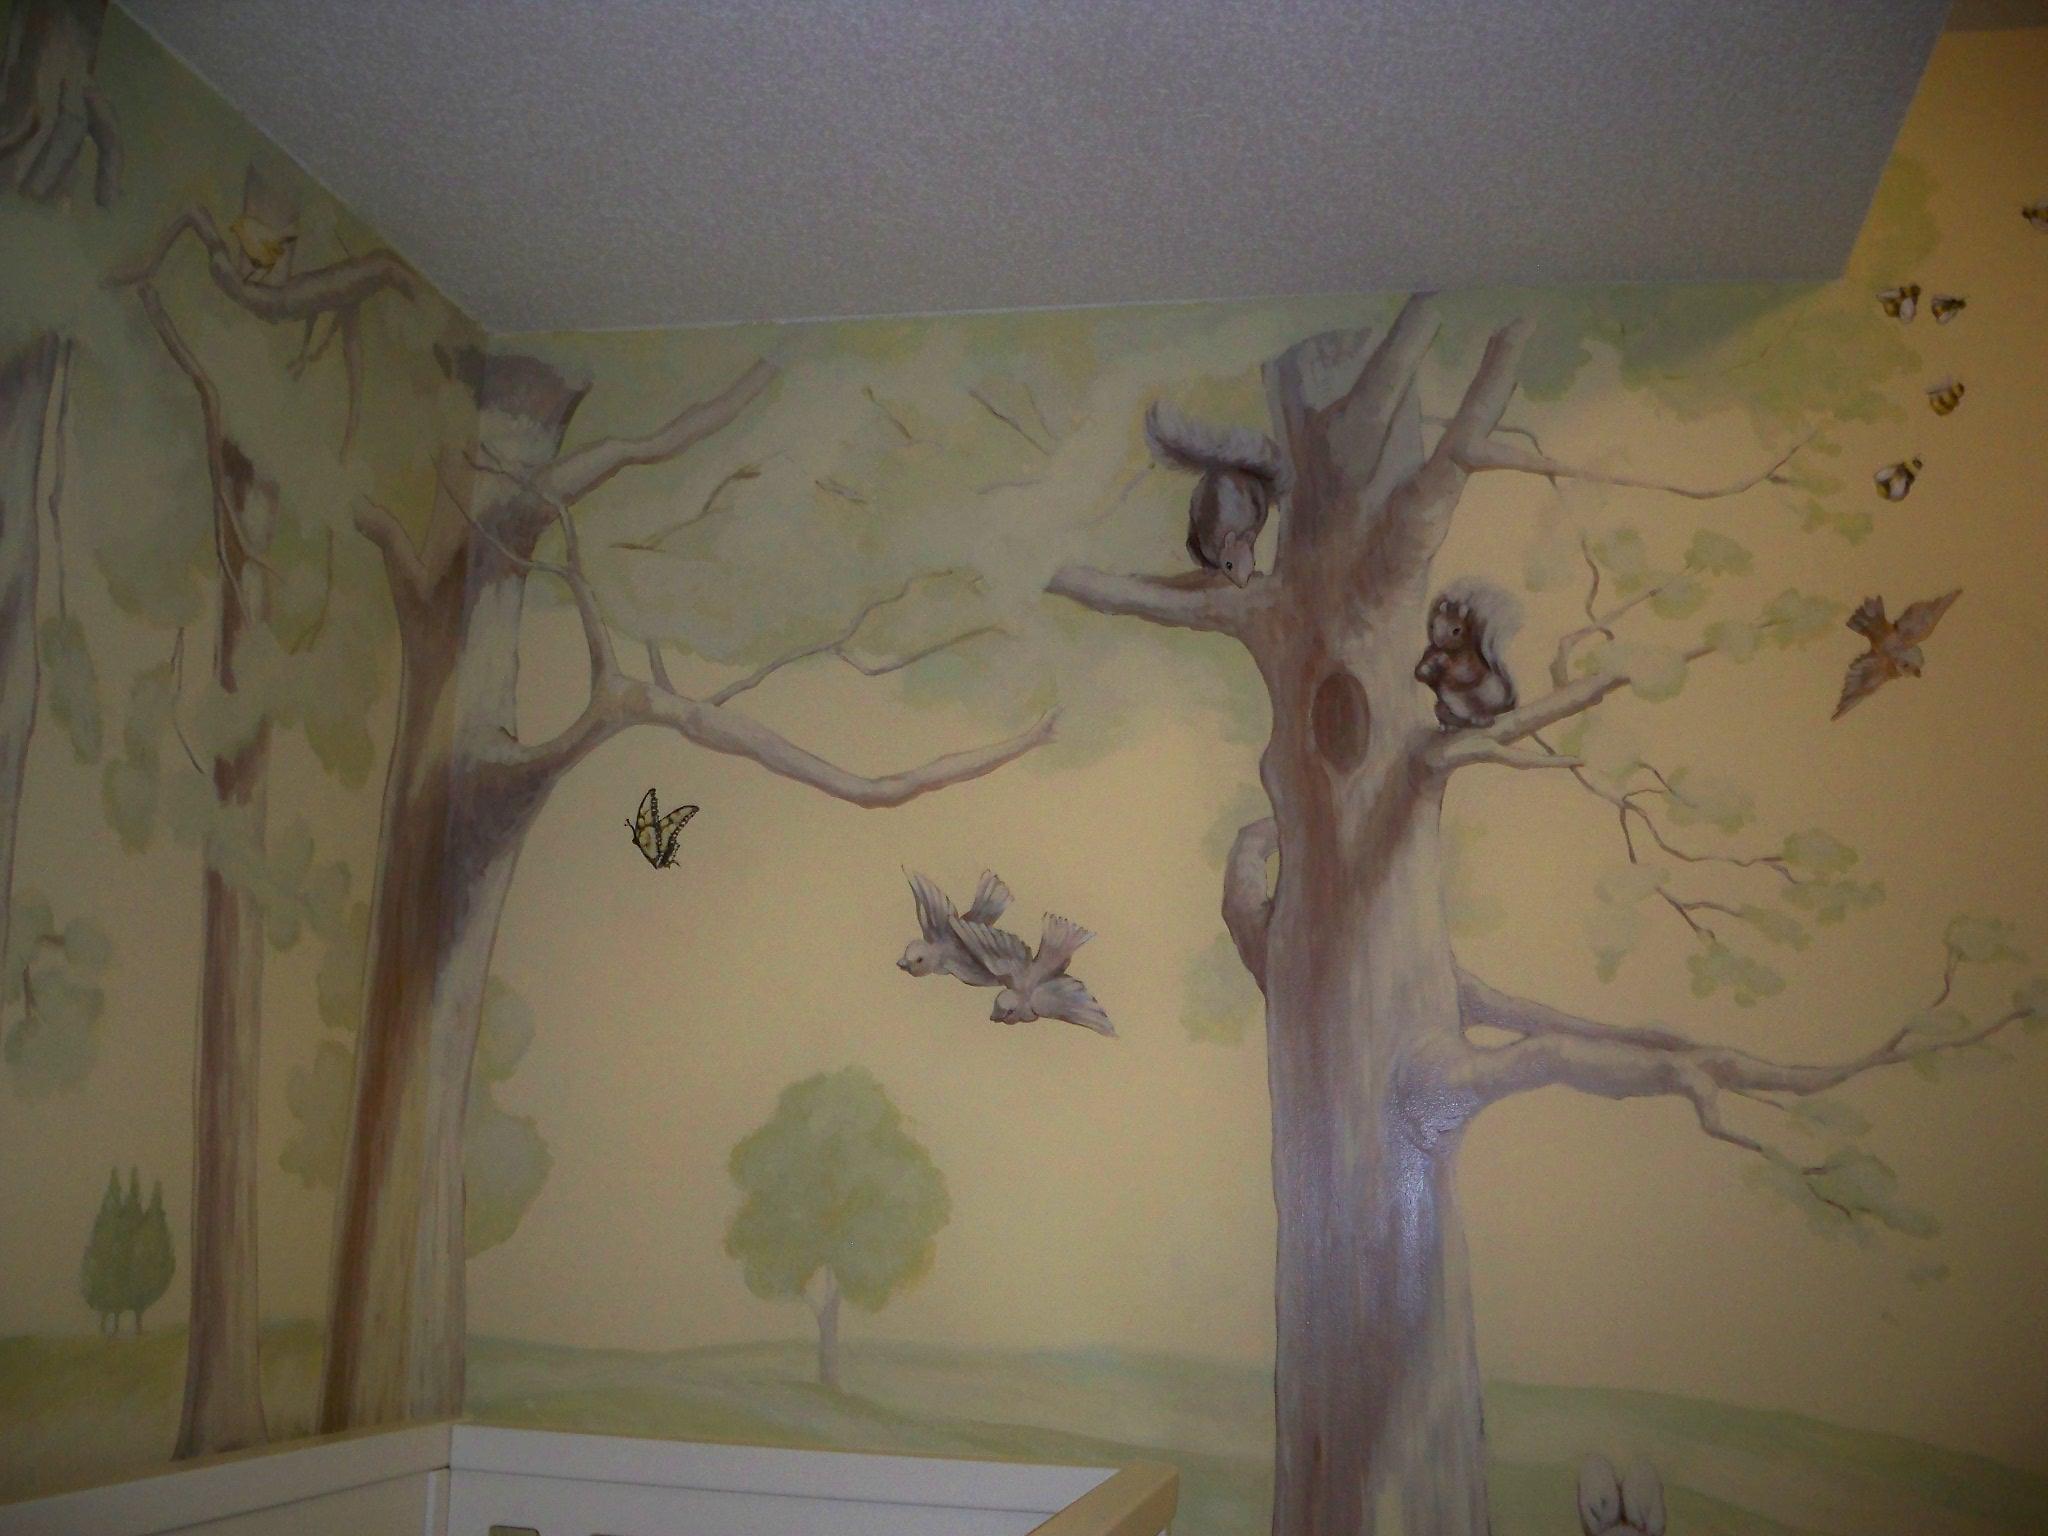 Murals By Marg Kayla's Nursery Mural 4